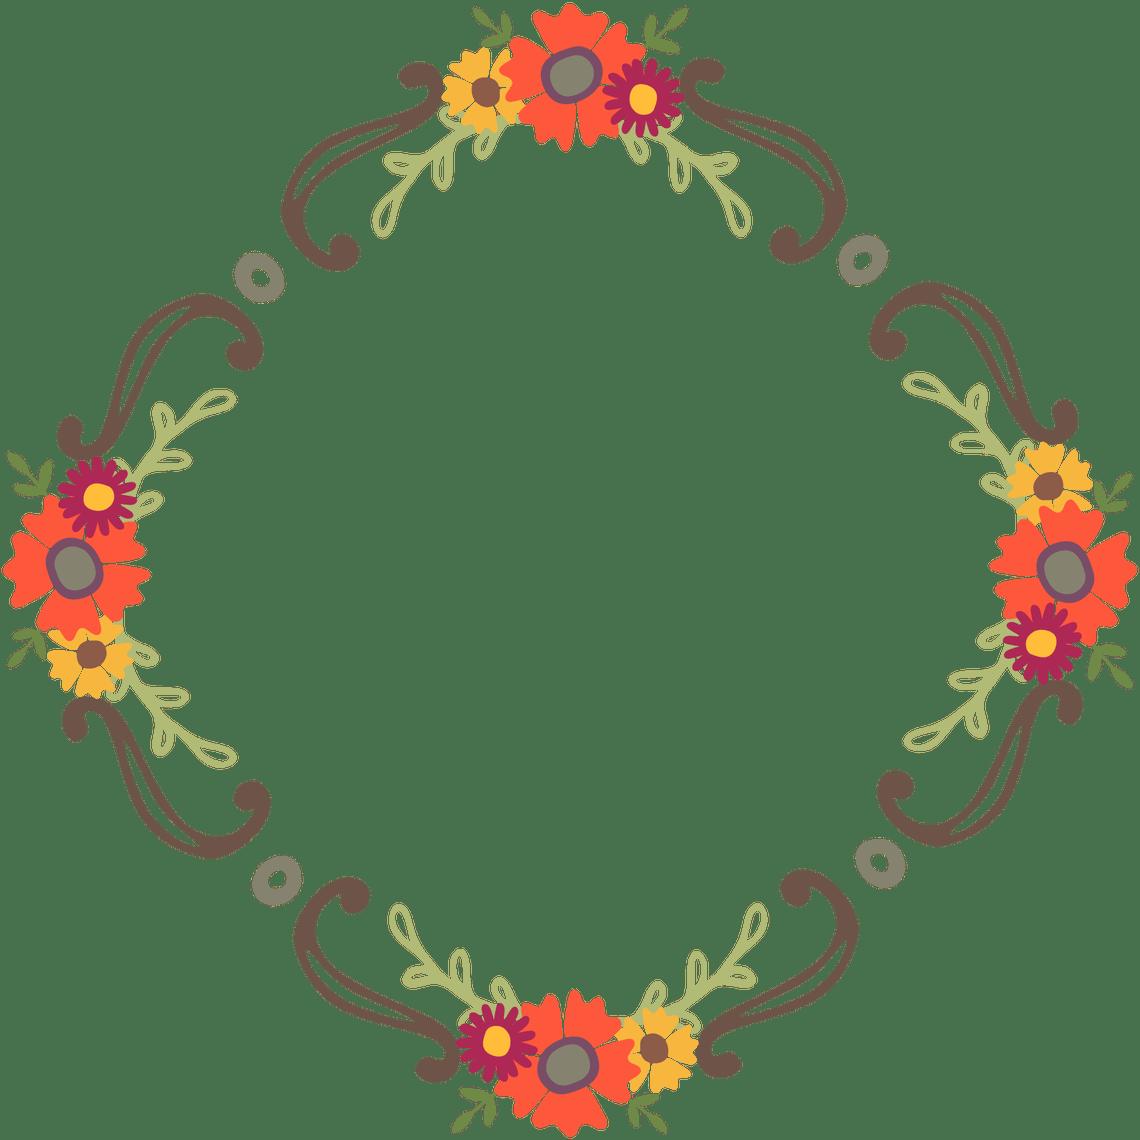 Laurel flower clipart vector freeuse download Free Floral Wreaths & Laurels for Graphic Design | Starsunflower ... vector freeuse download